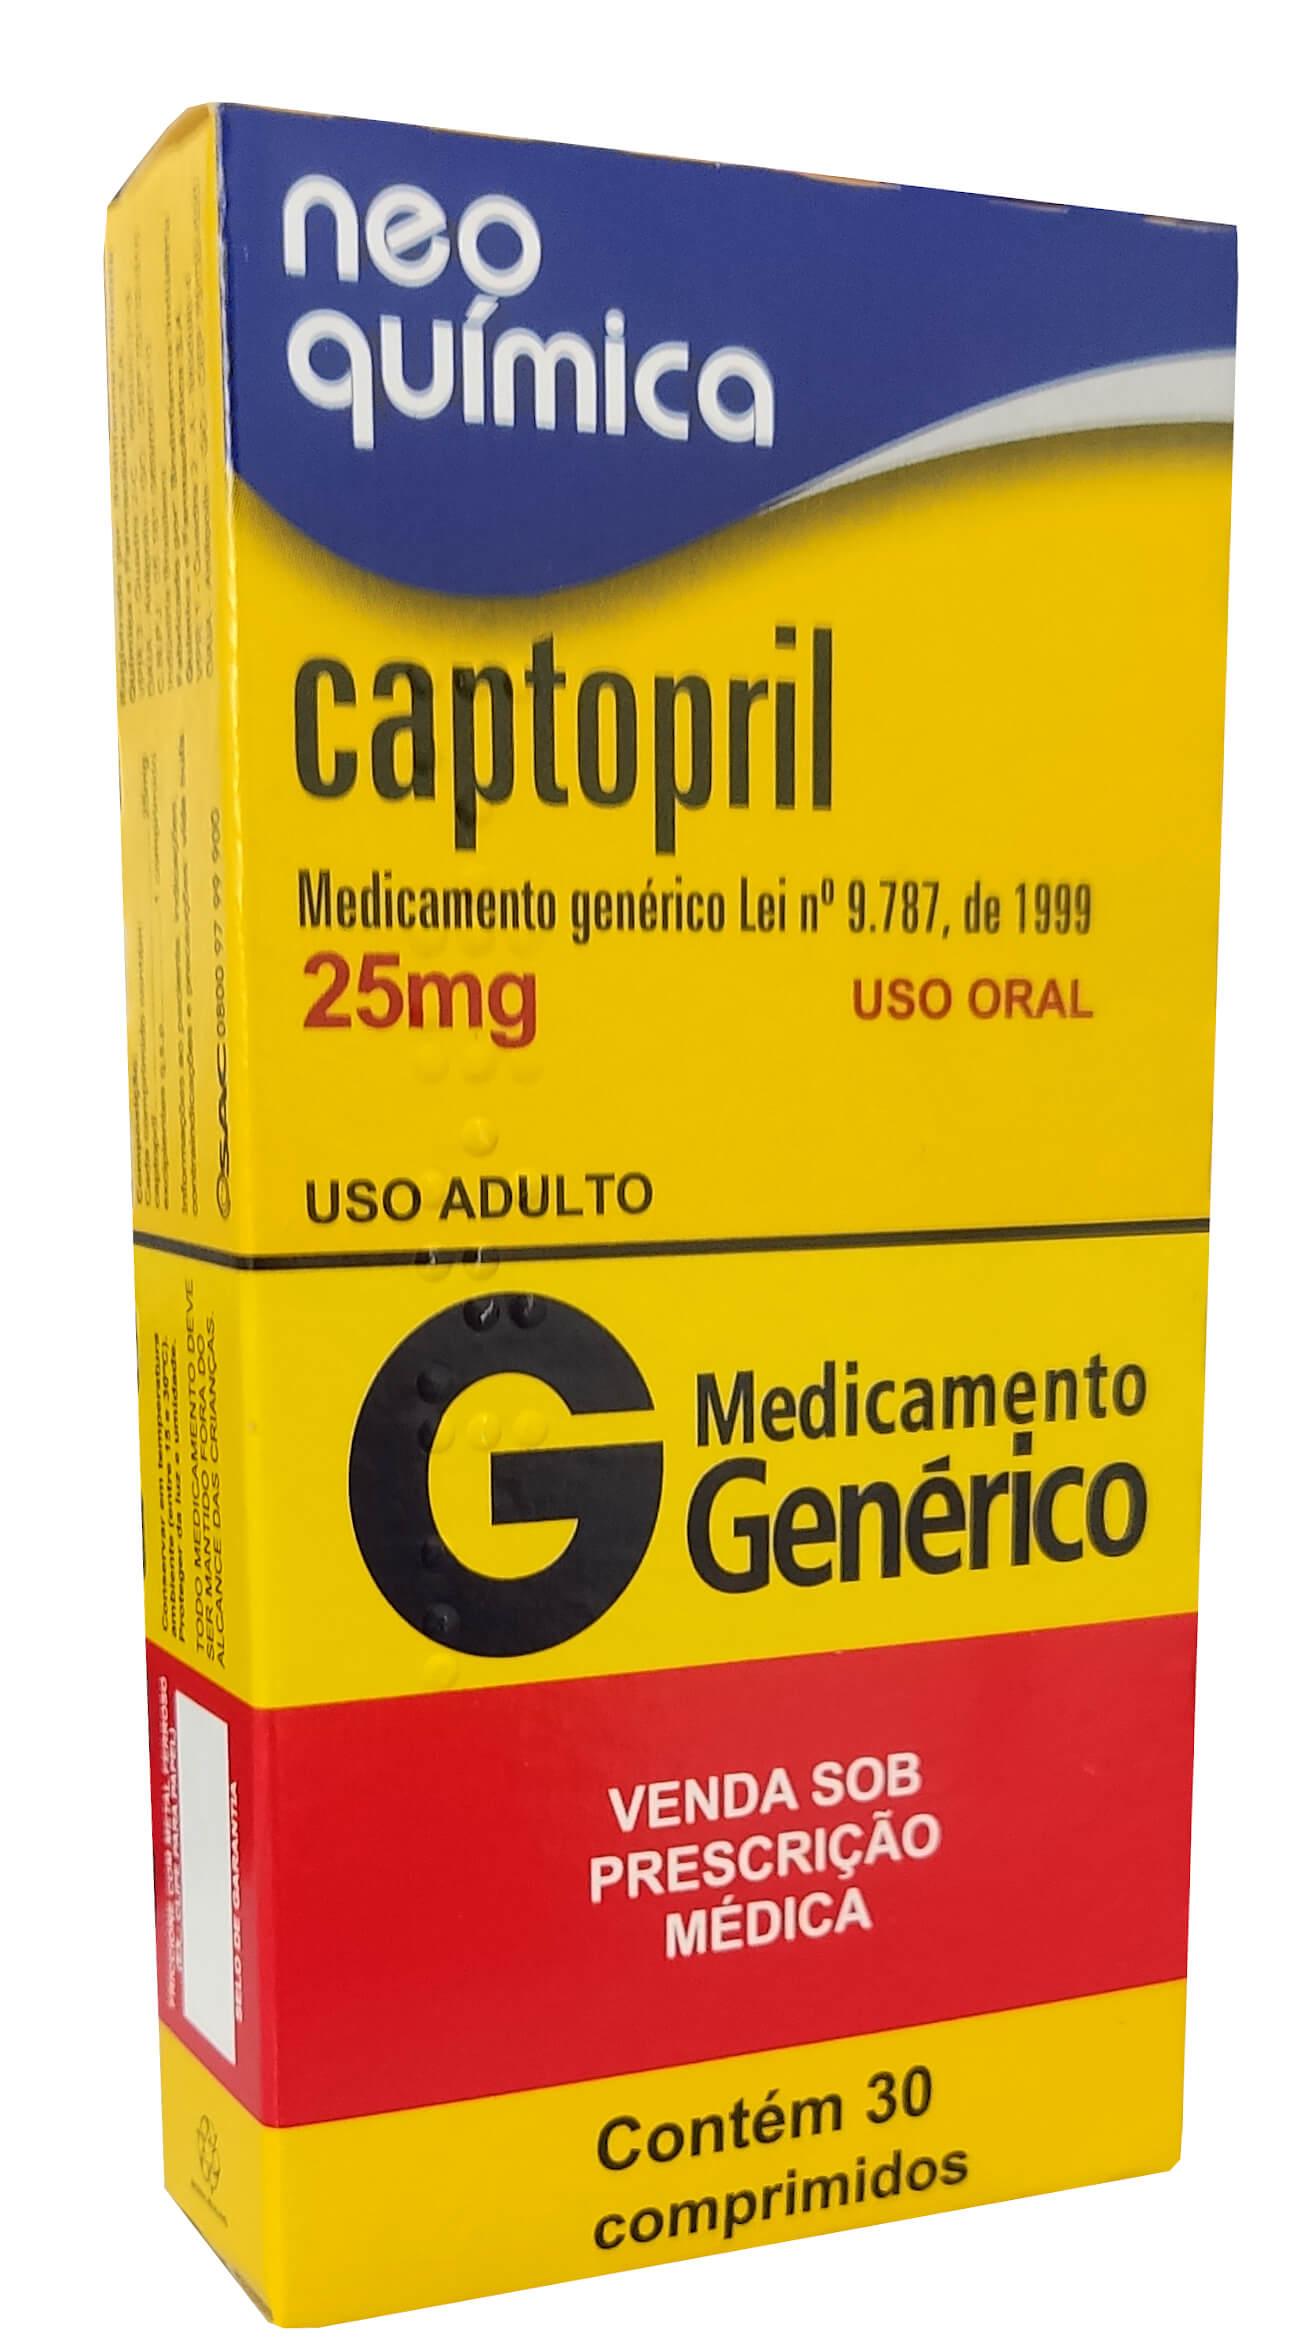 Bromazepam 6 mg bei flugangst